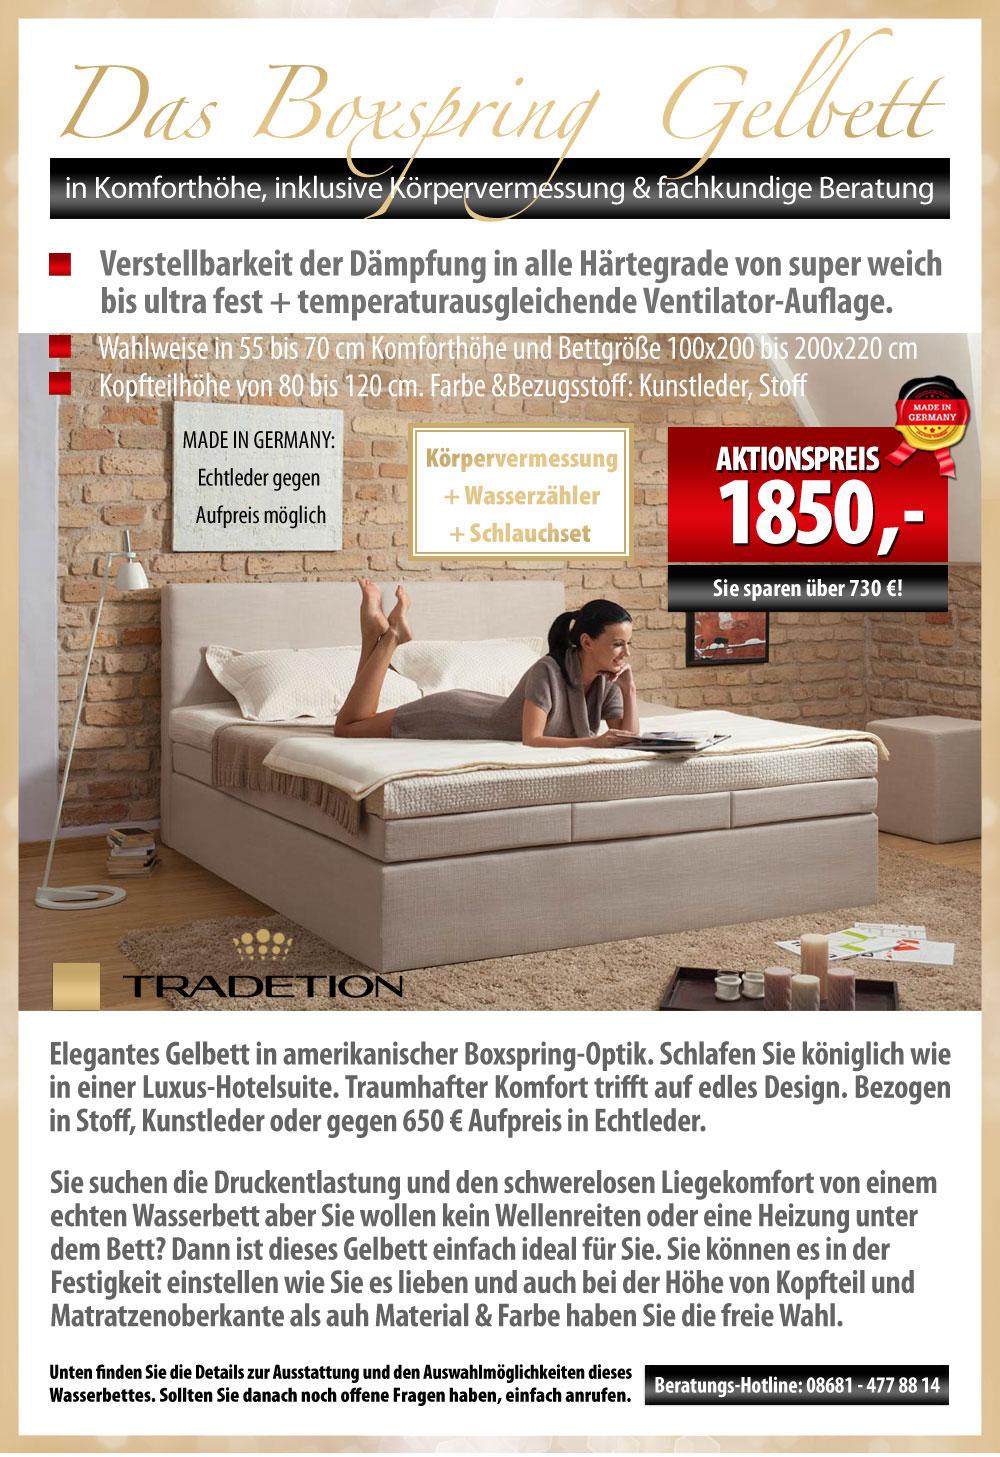 aktion edles gelbett im boxspringbett stil mit. Black Bedroom Furniture Sets. Home Design Ideas